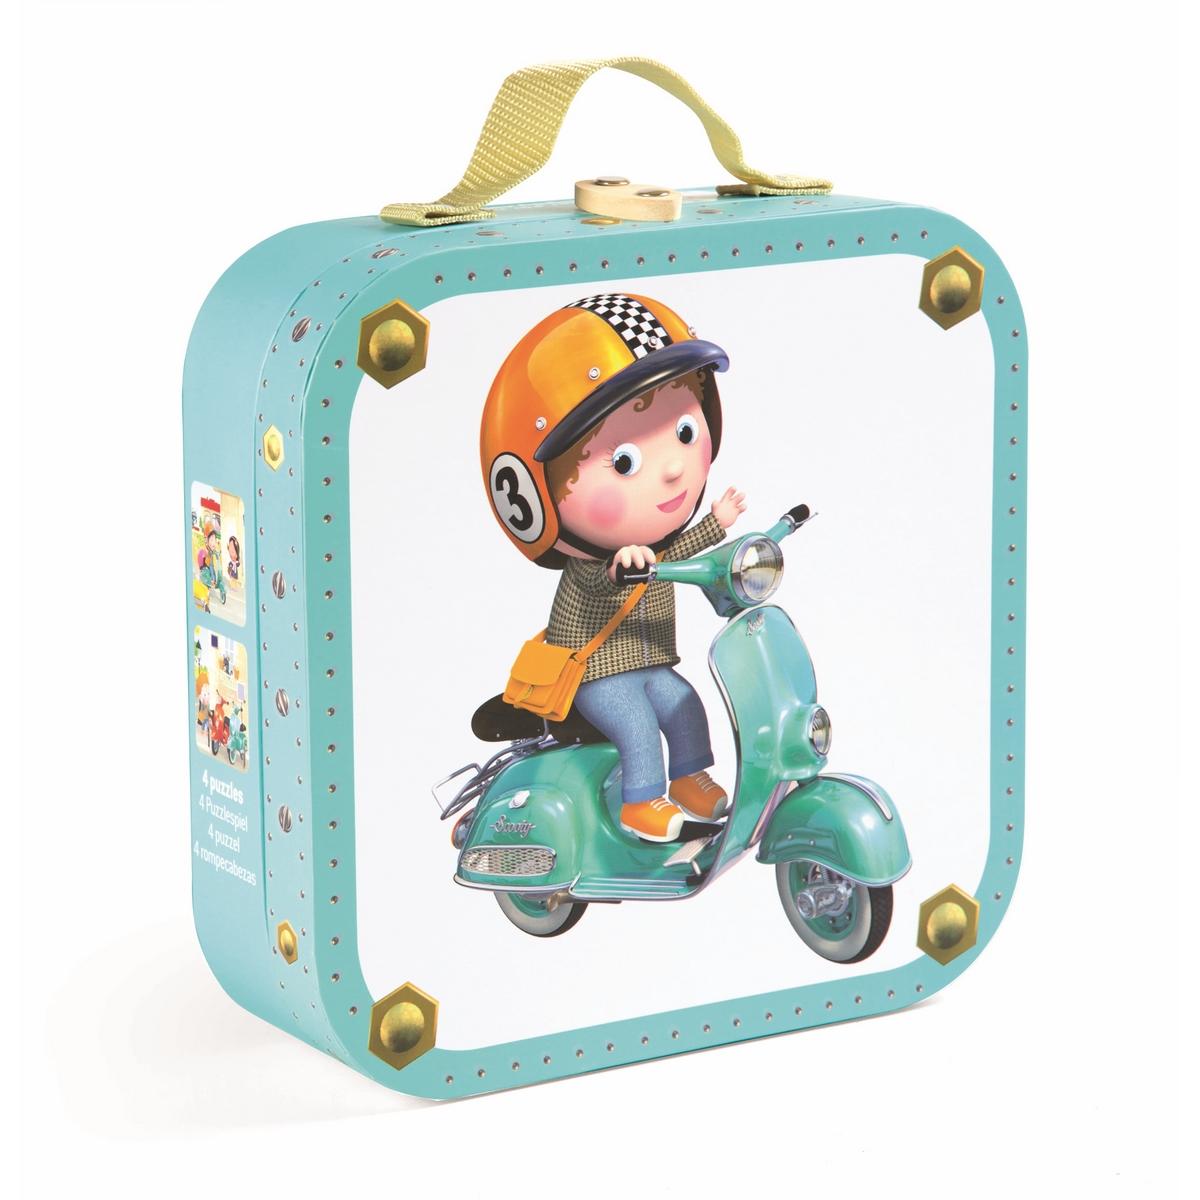 Janod Набор пазлов для малышей На скутере на 6, 9, 12 и 16 деталей janod пазл я мама 4 в 1